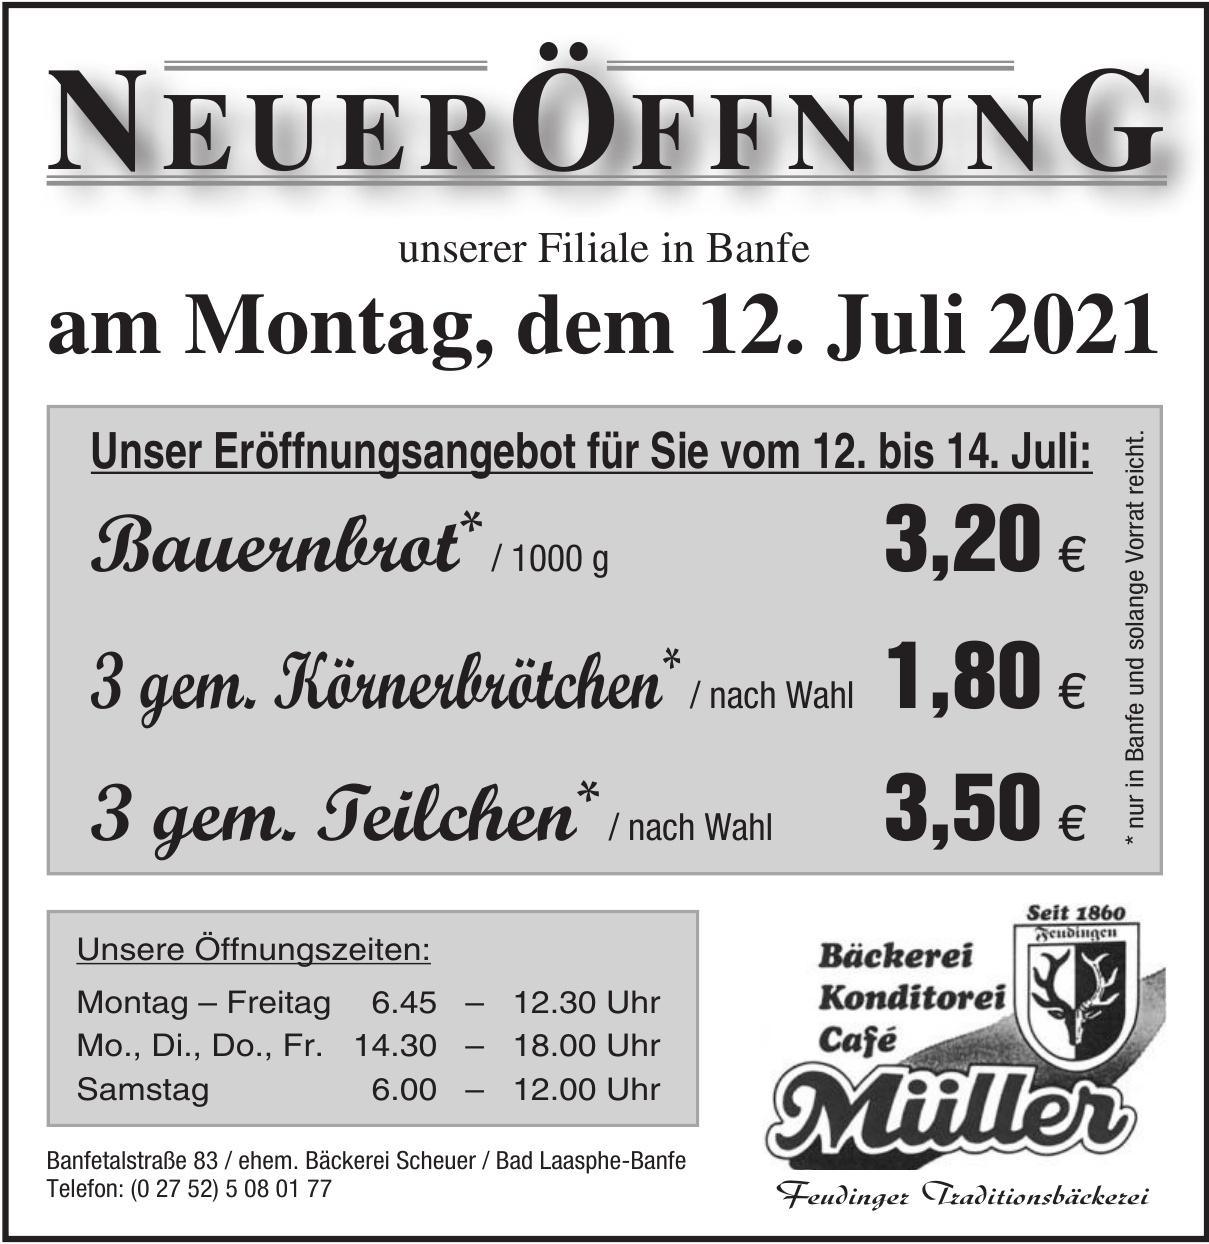 Bäckerei Konditorei Café Müller